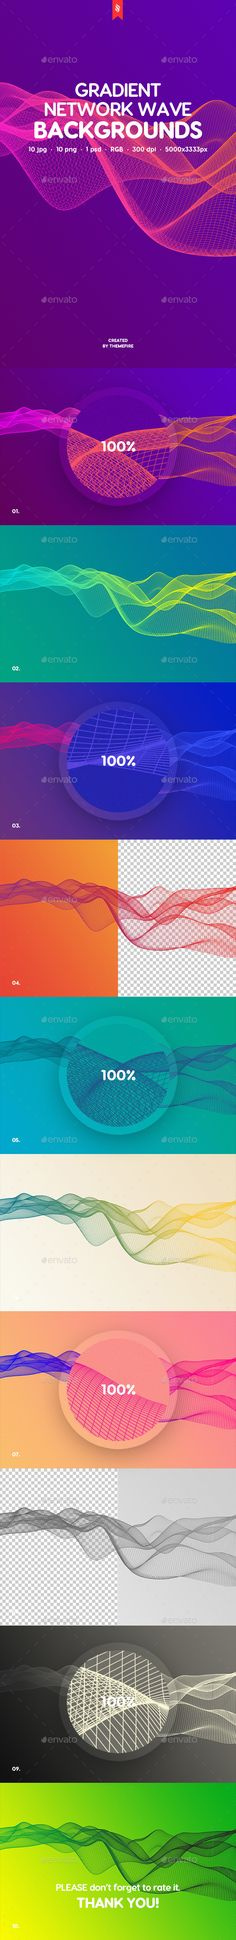 Gradient Network Wave Backgrounds